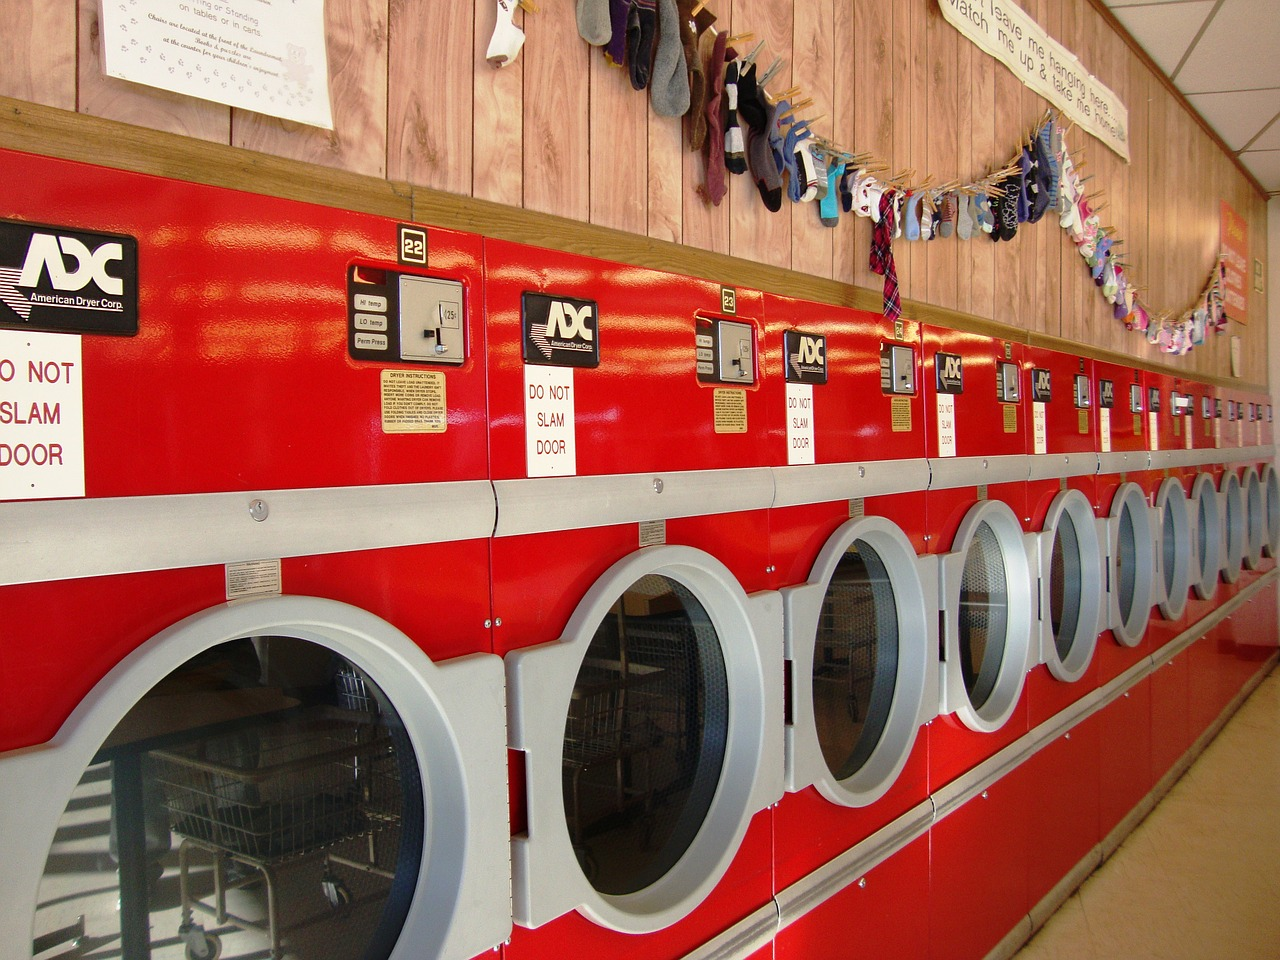 Red washing machines